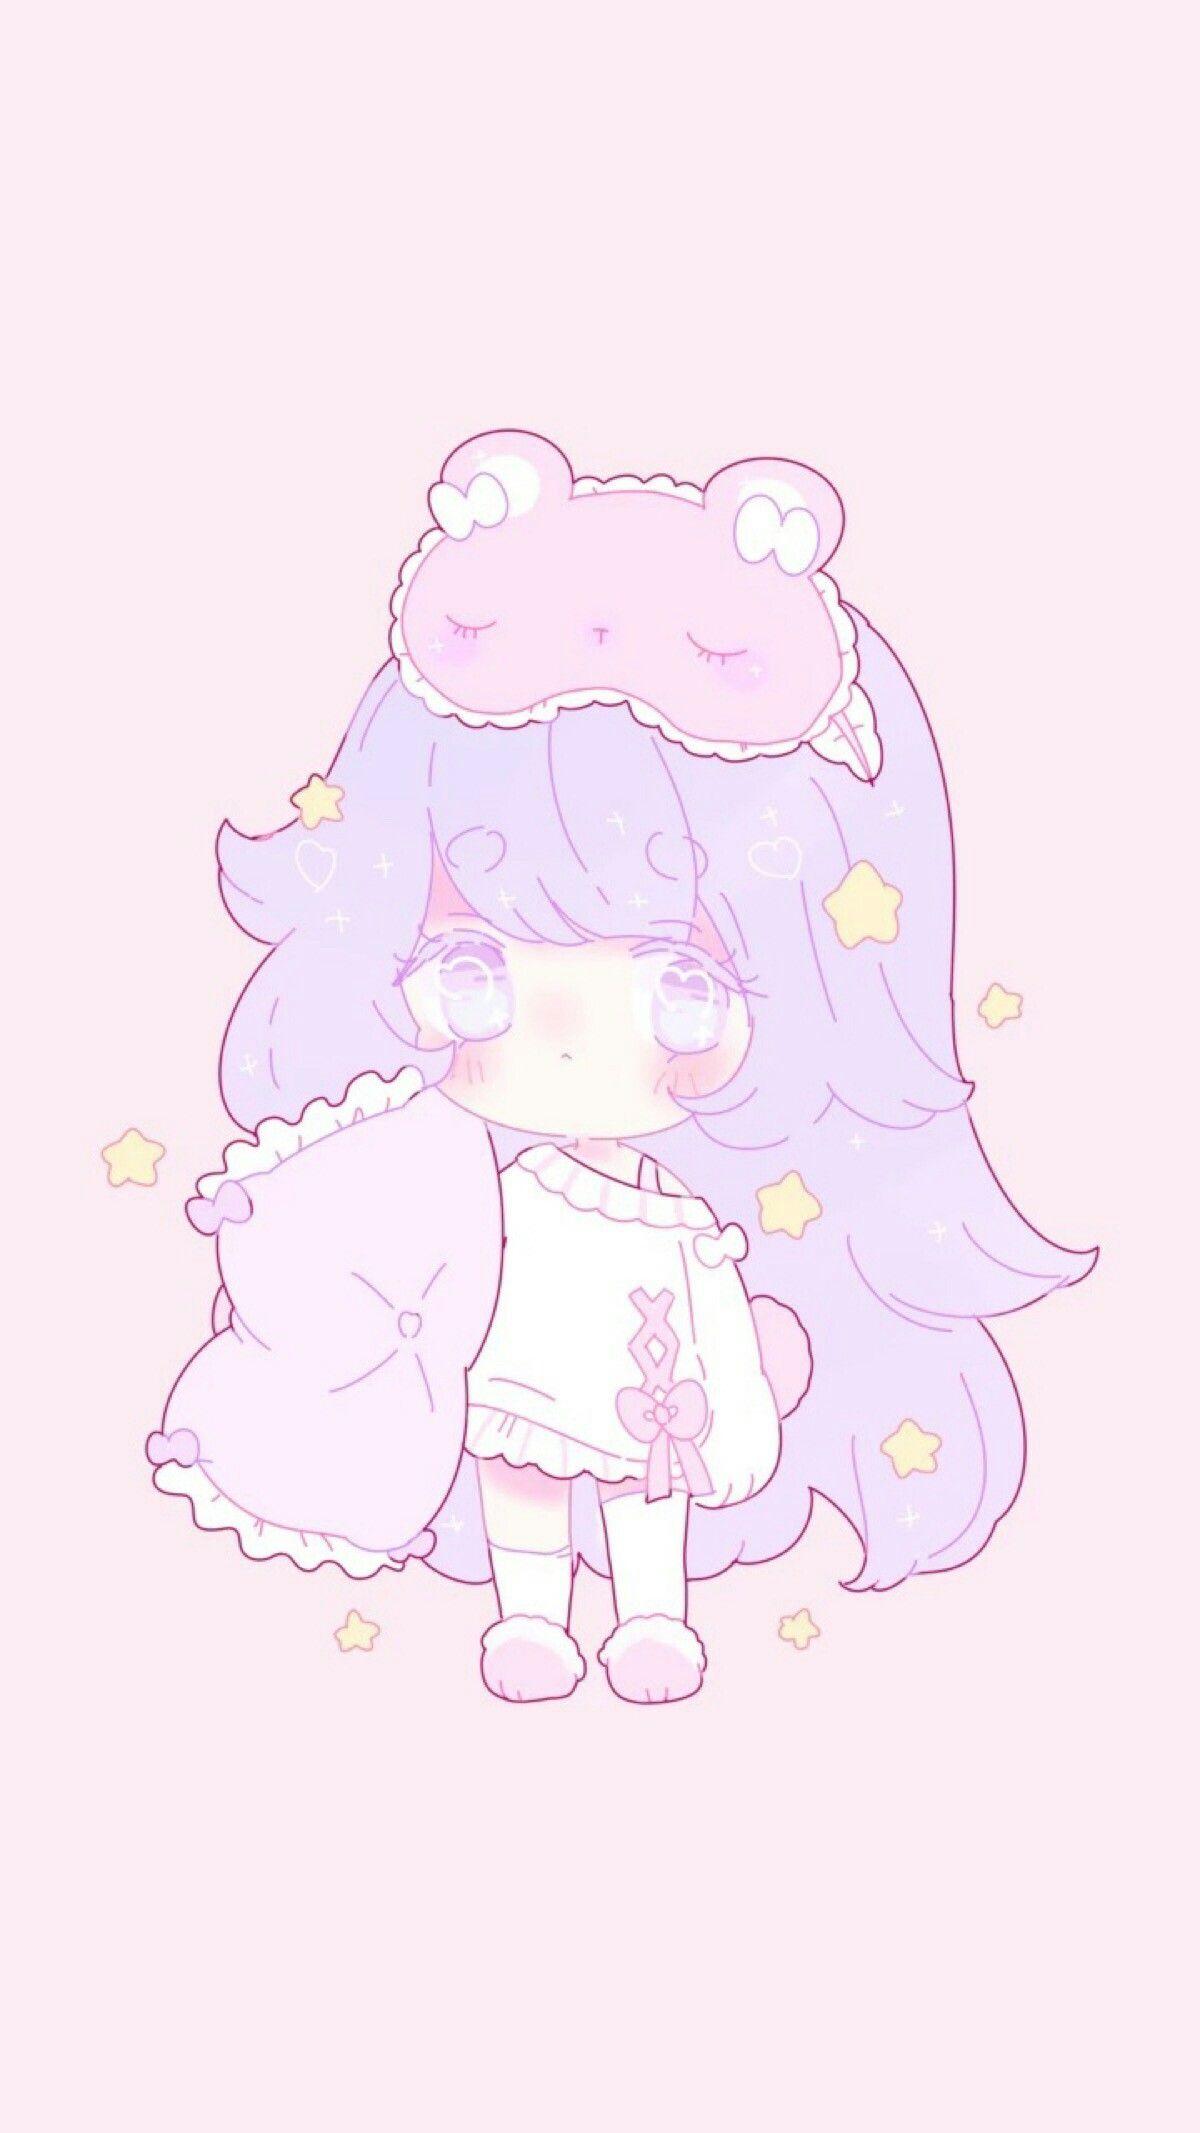 Ytye Vavu Anime Wallpaper Cute Anime Wallpaper Kawaii Anime